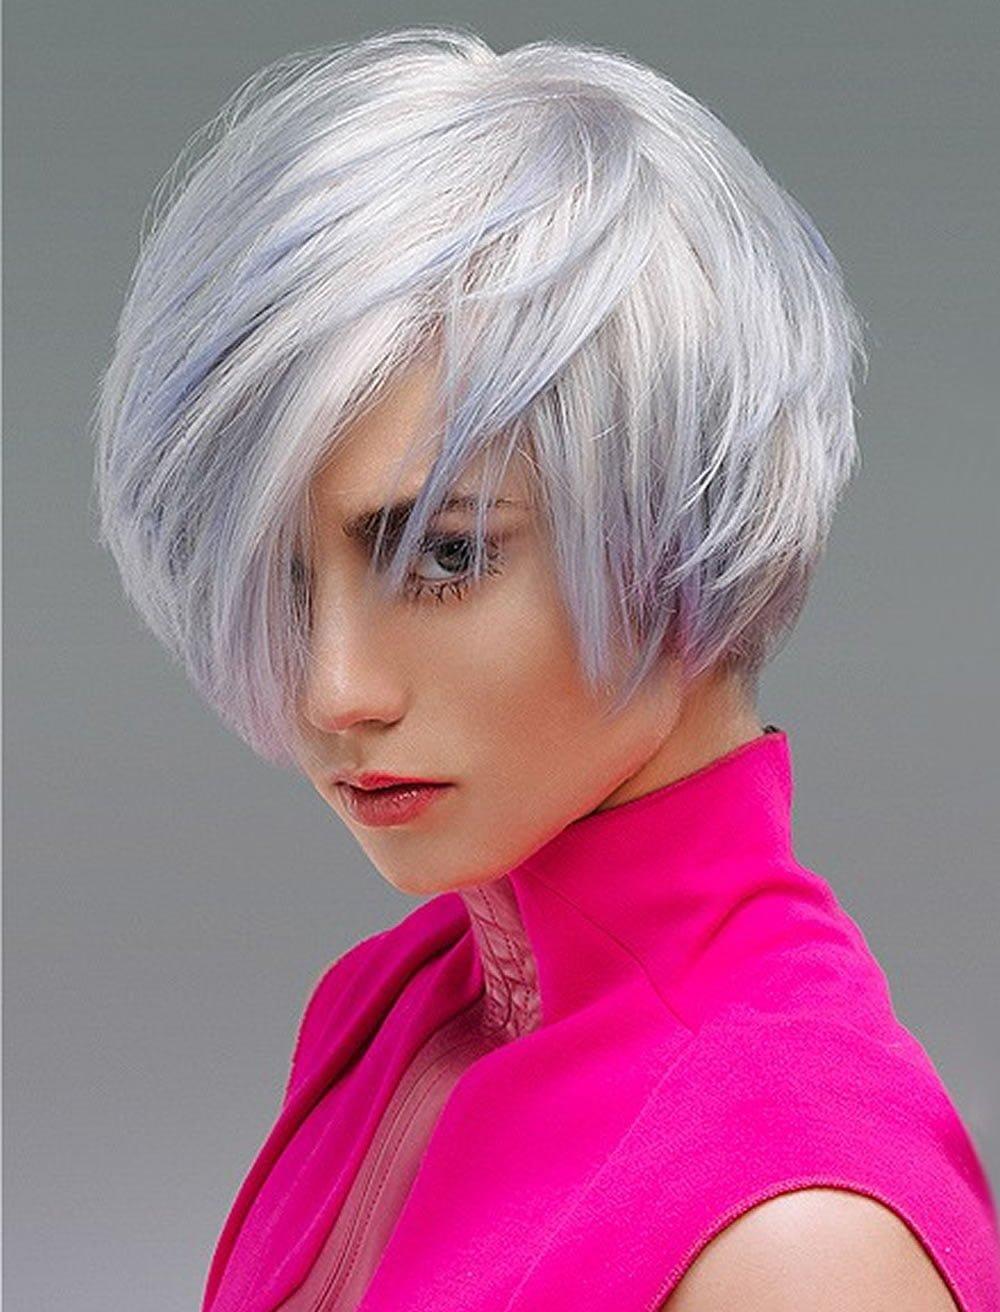 Grey hair color asymmetrical bob hairstyles 2019 - Hair Colors